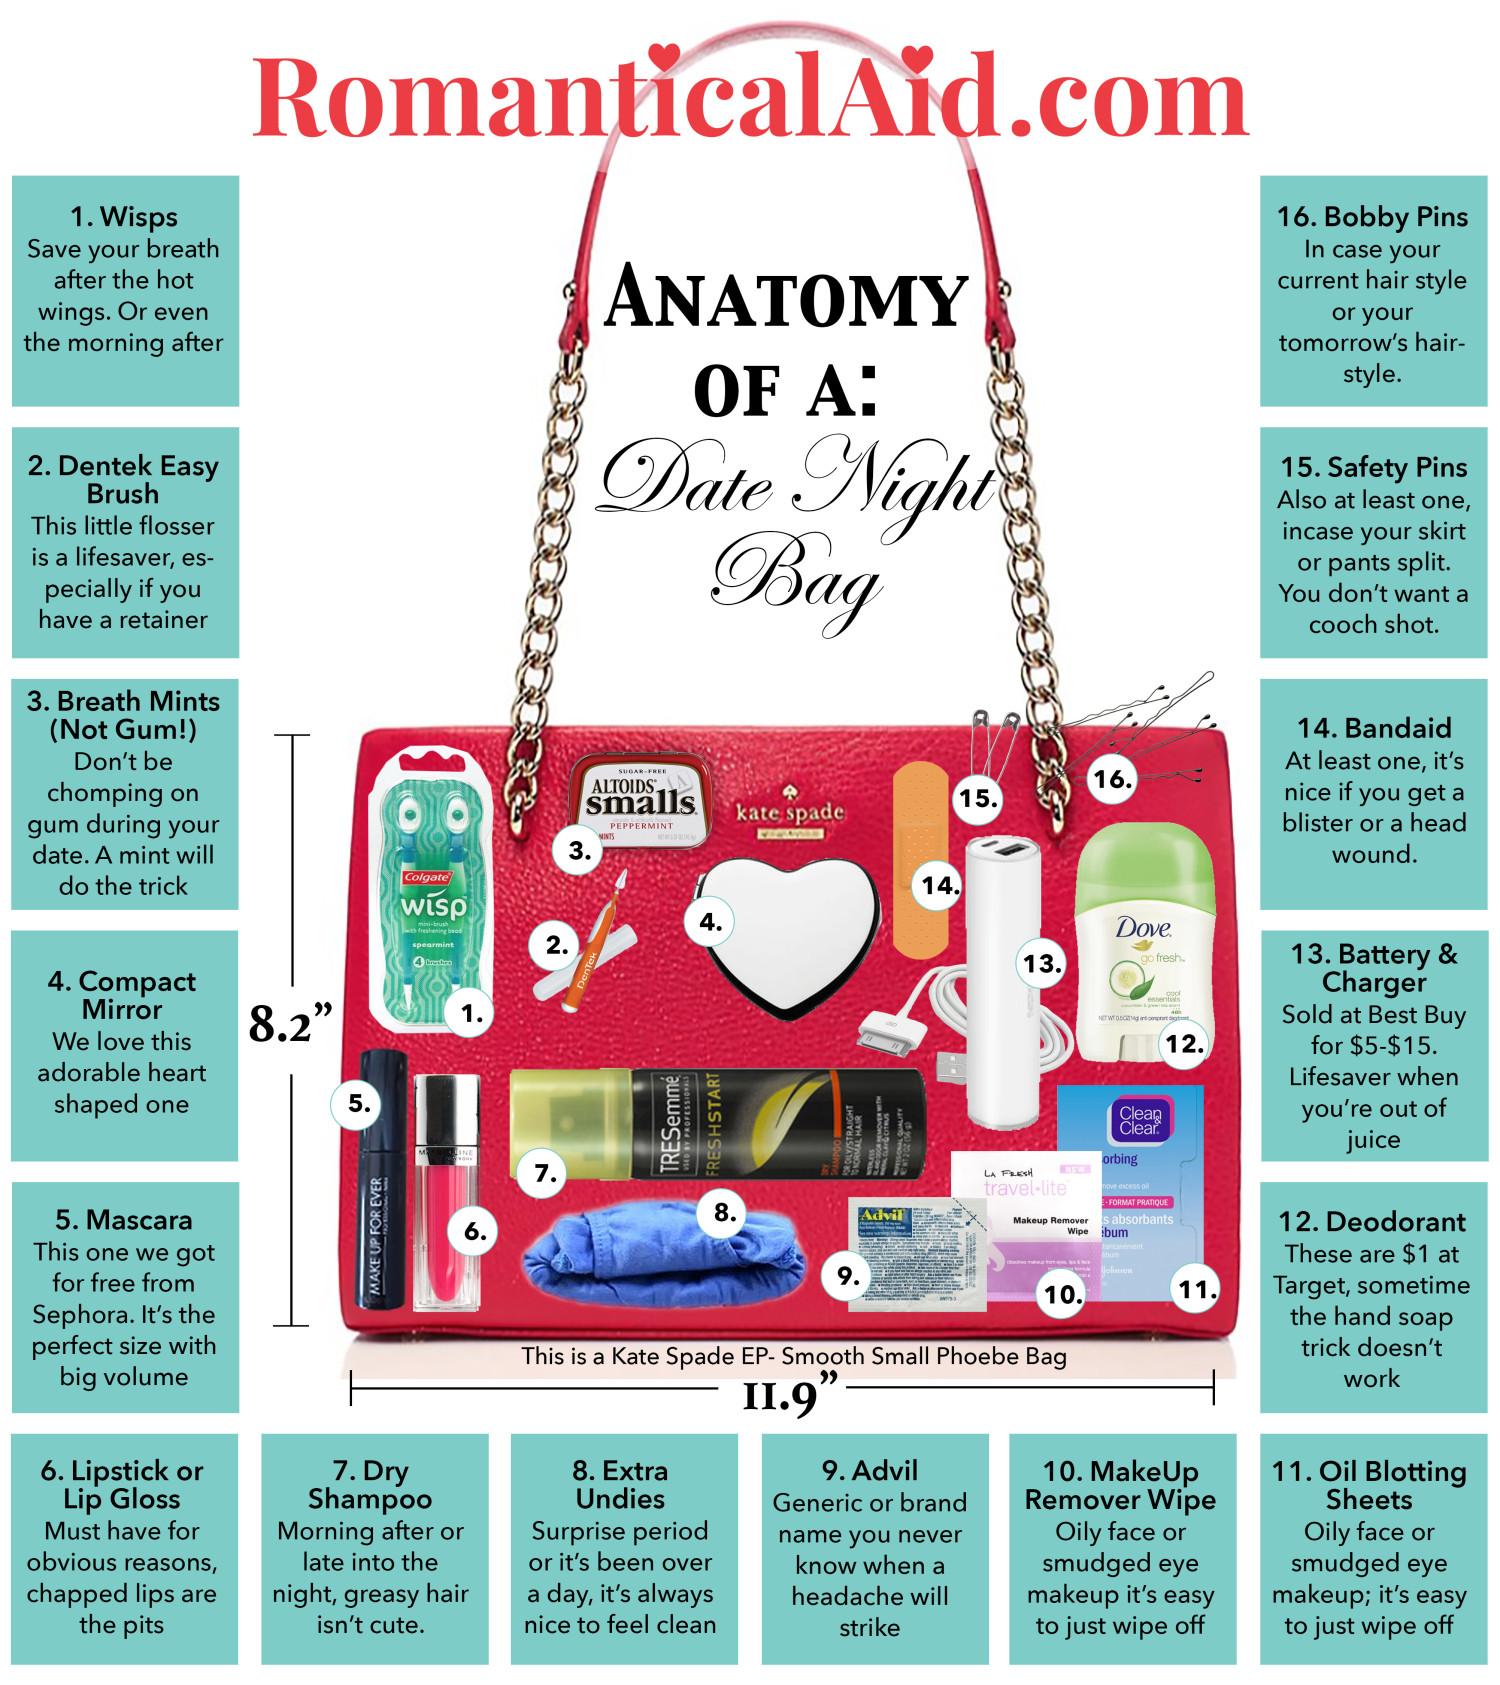 Anatomy of Date Night Bag InfoGraphic